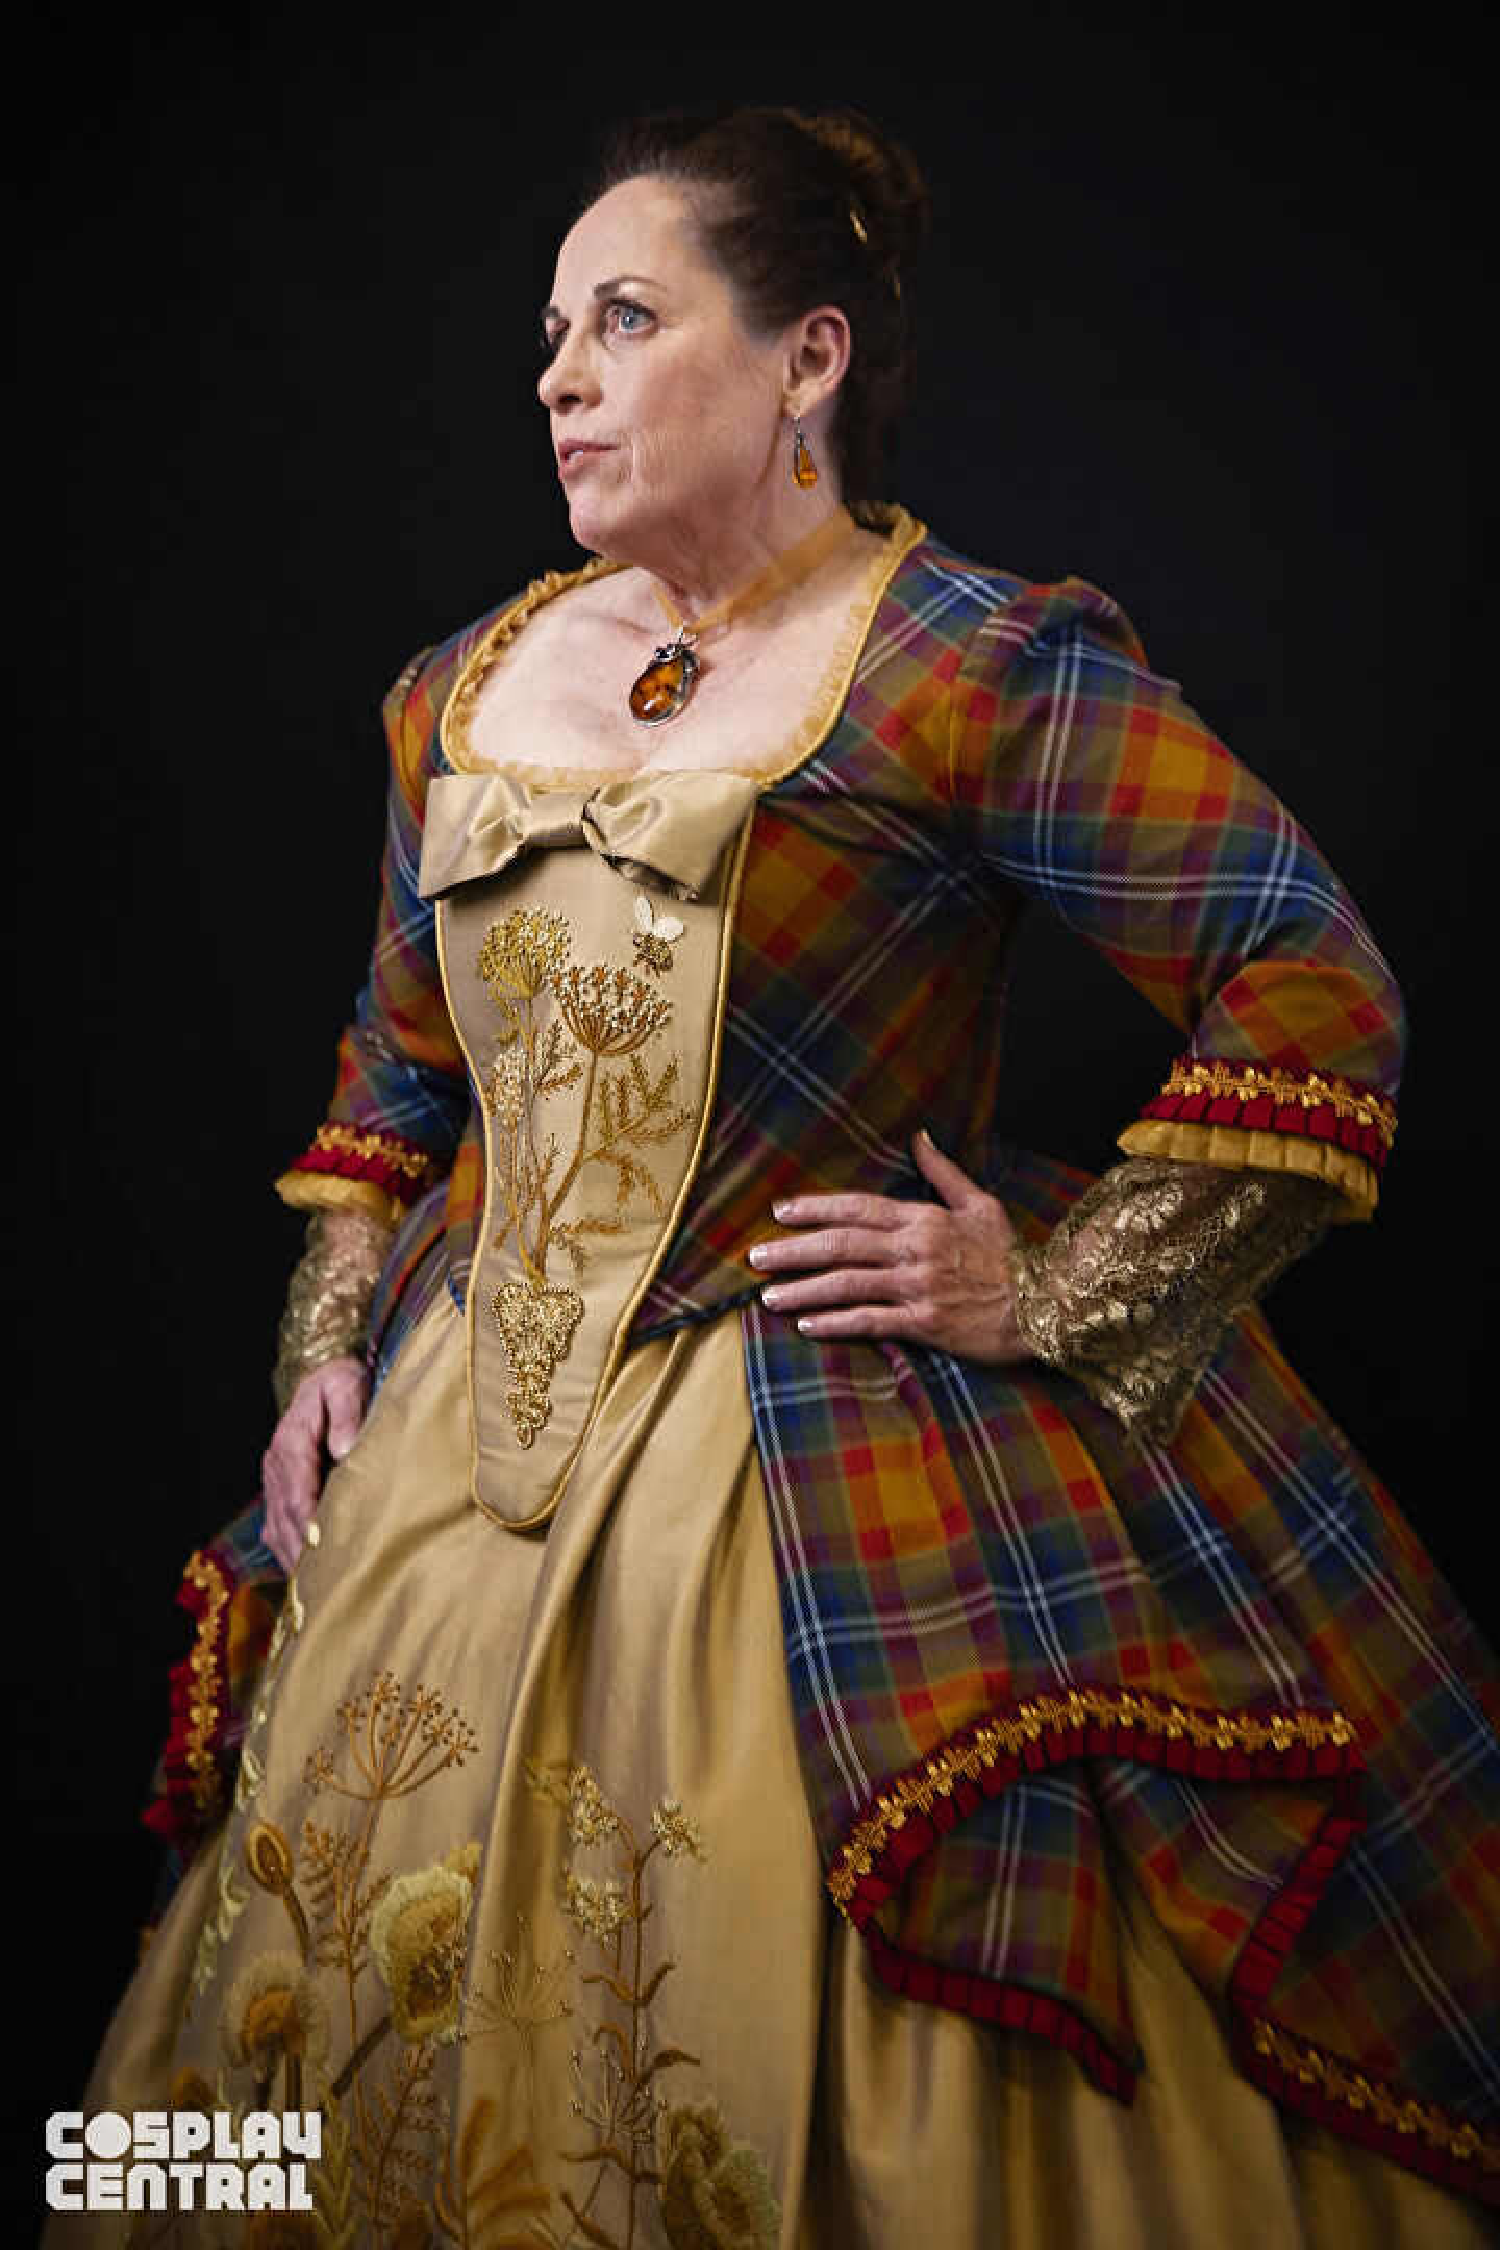 Teri Biglands' Outlander-inspired cosplay